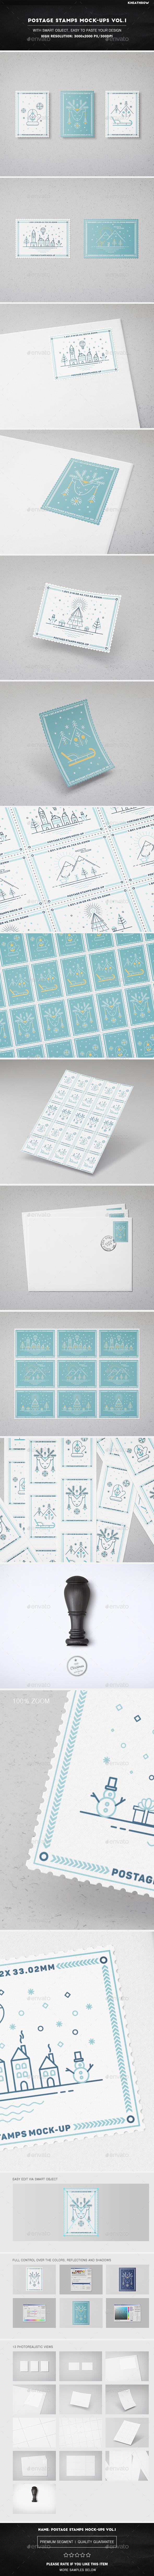 Postage Stamps Mock-Ups Vol.1 - Product Mock-Ups Graphics